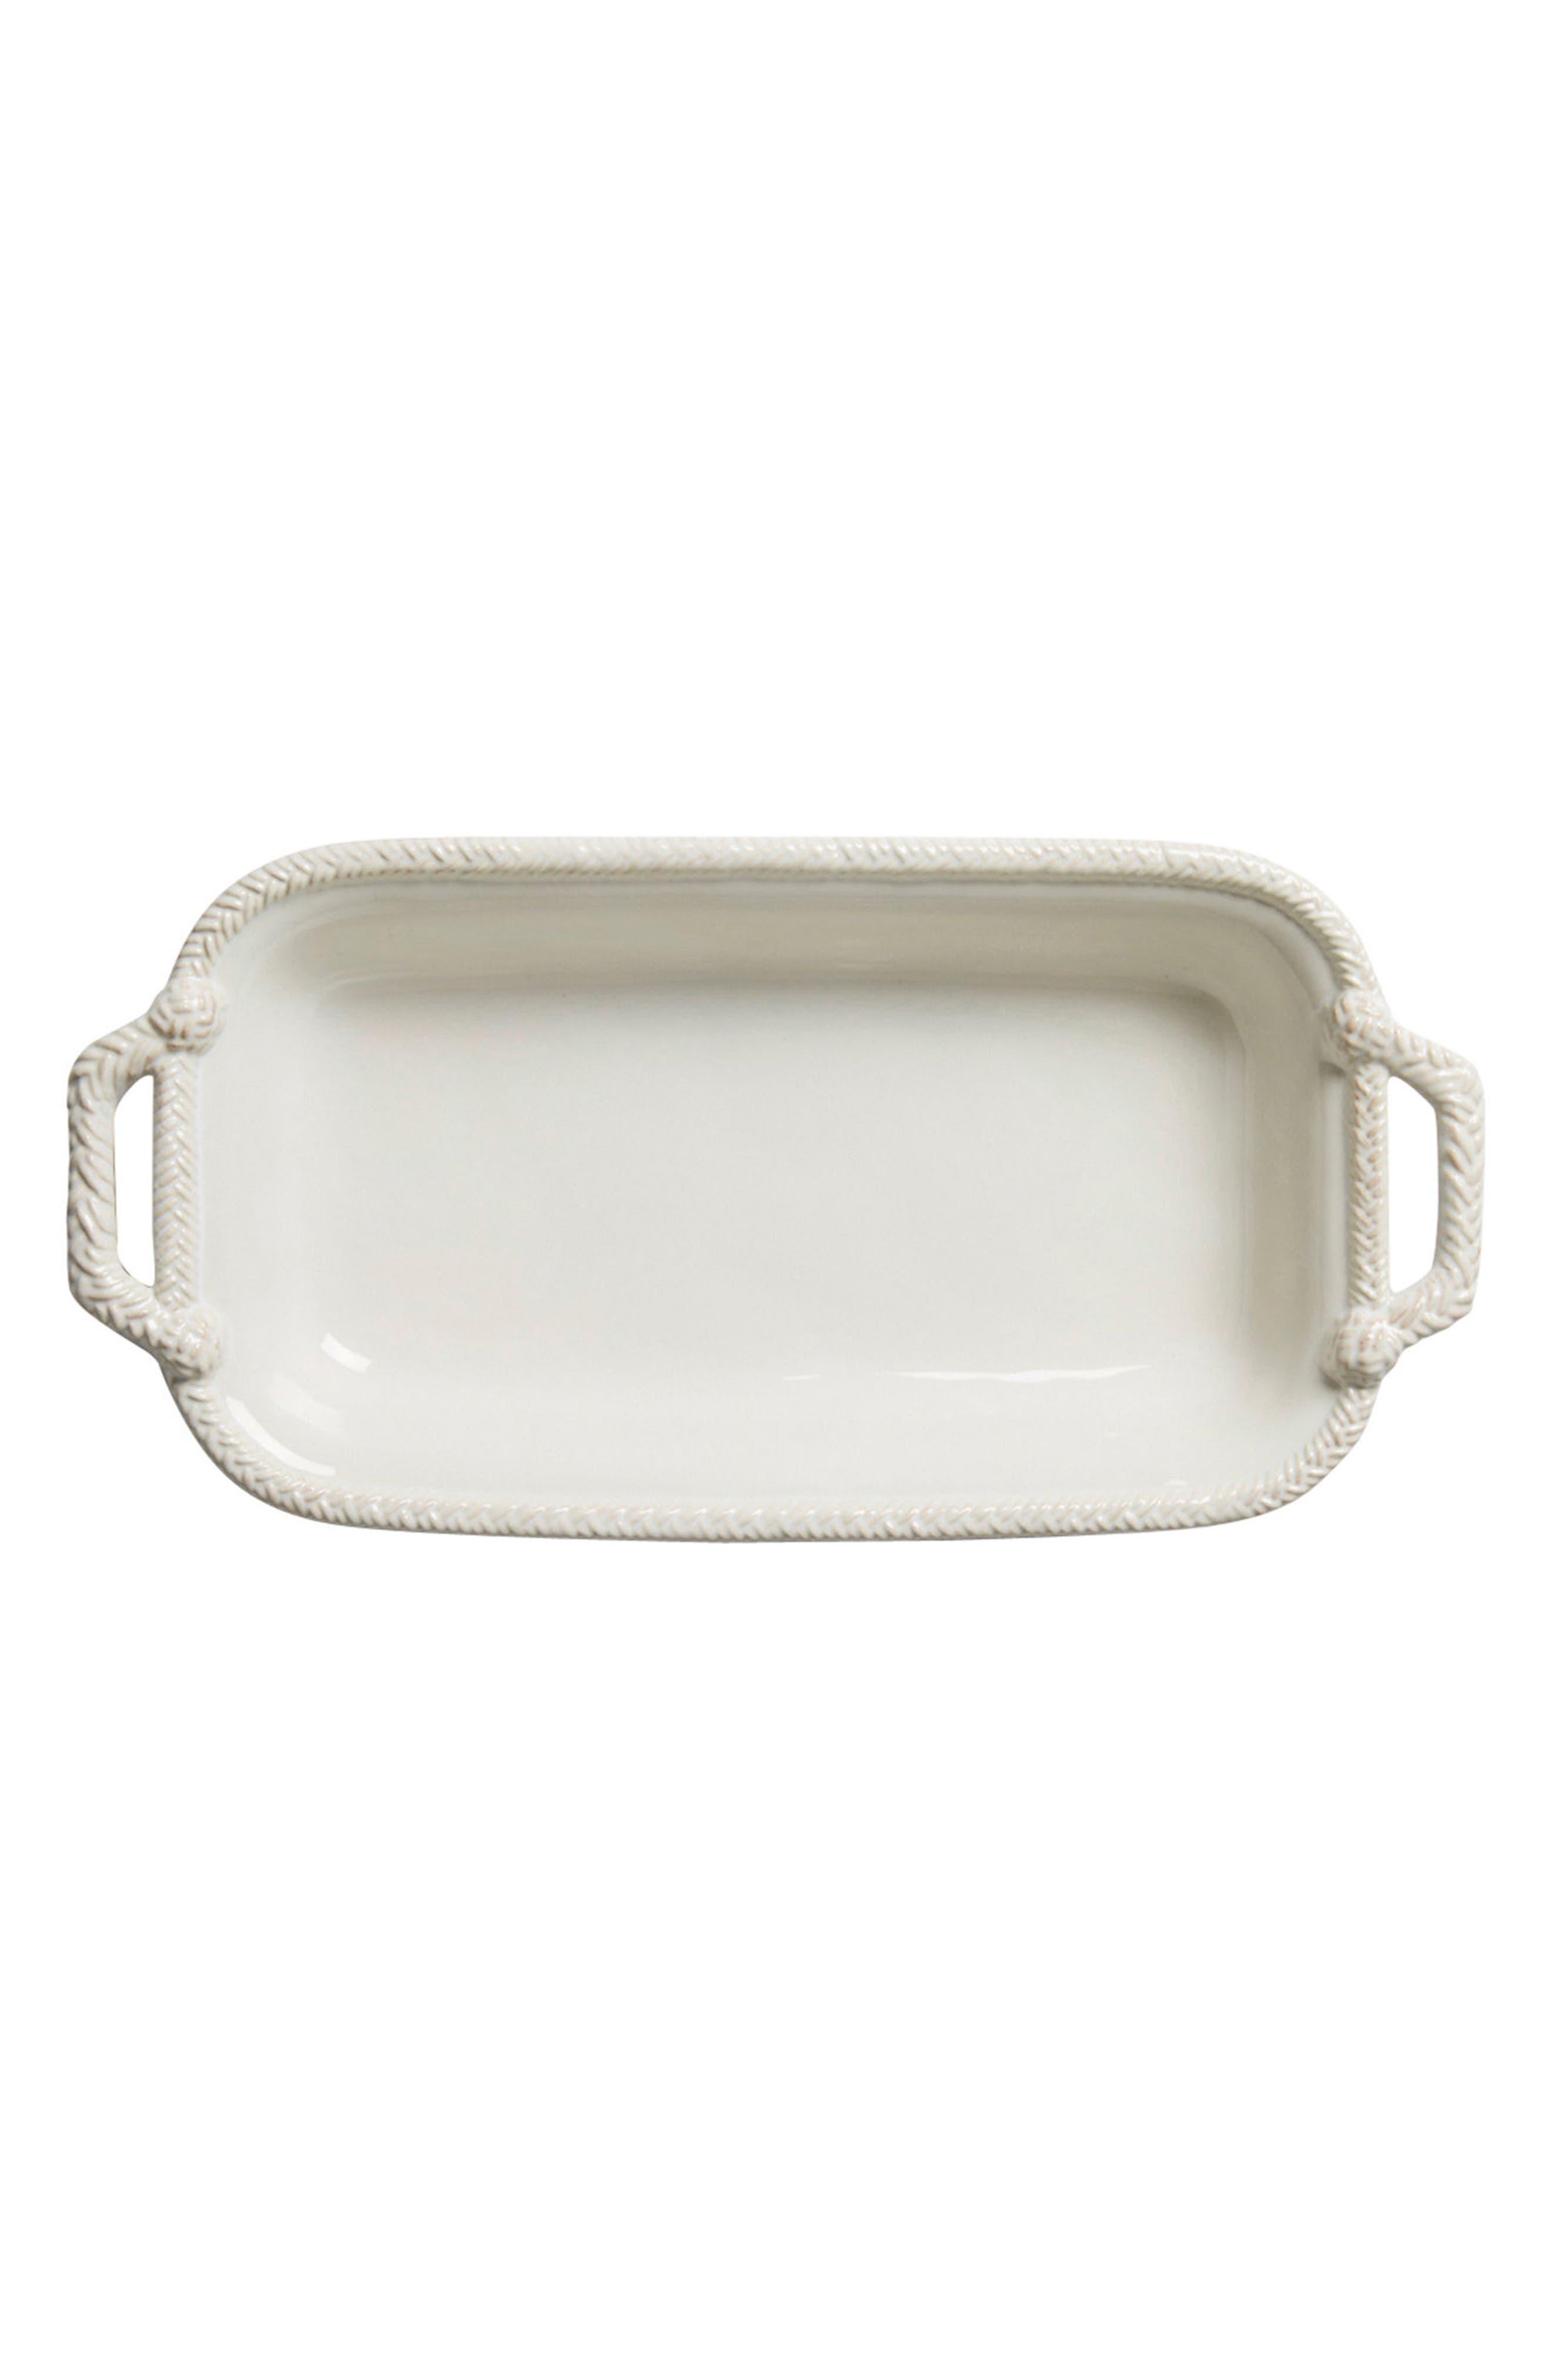 Le Panier 1.5-Quart Rectangular Baking Dish,                             Main thumbnail 1, color,                             Whitewash